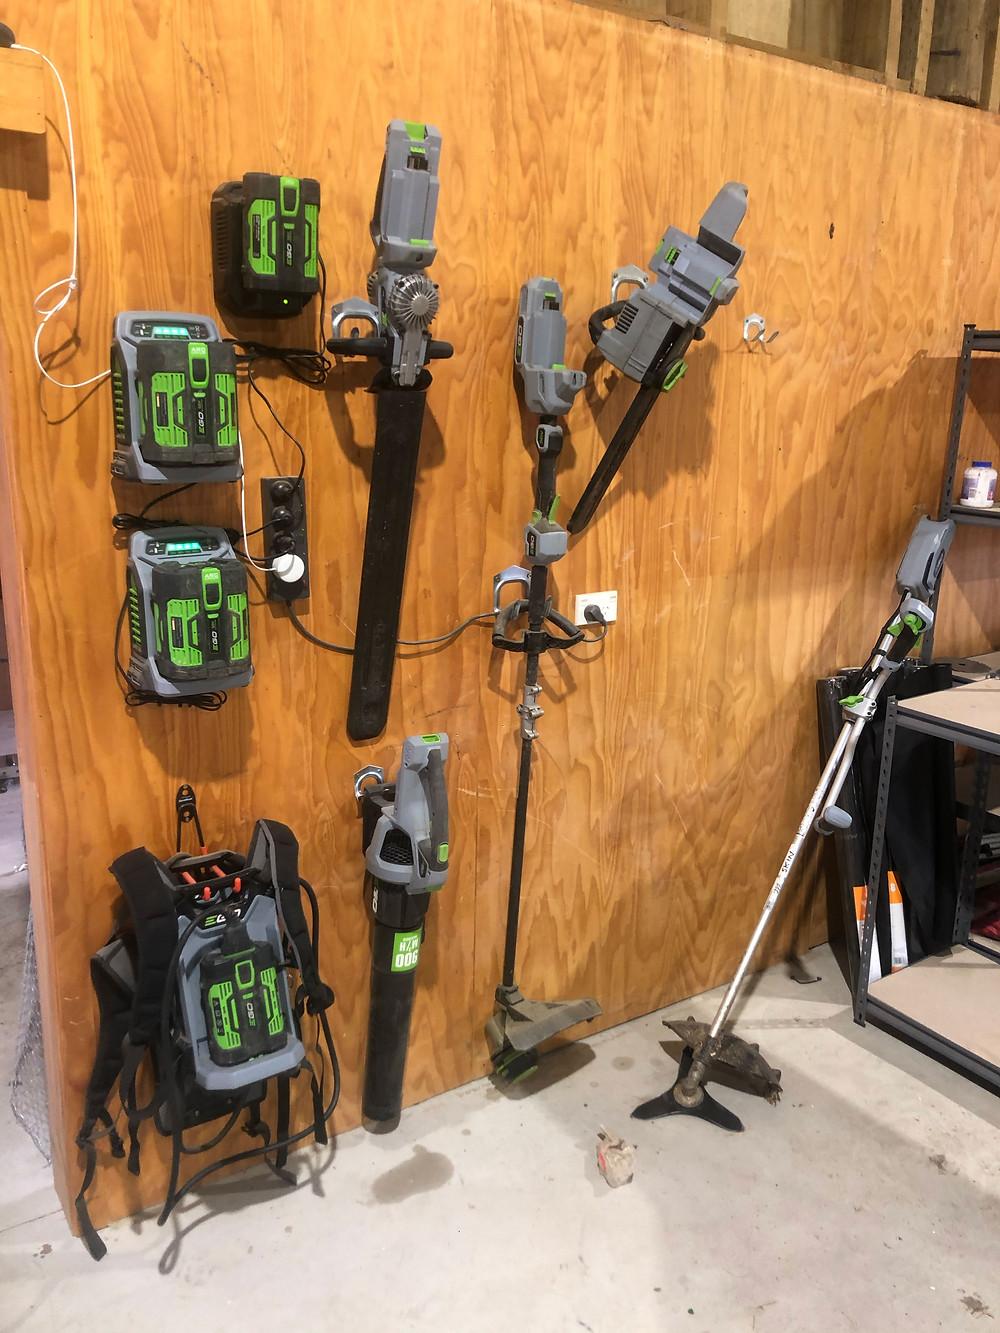 Ego electric gardening tools